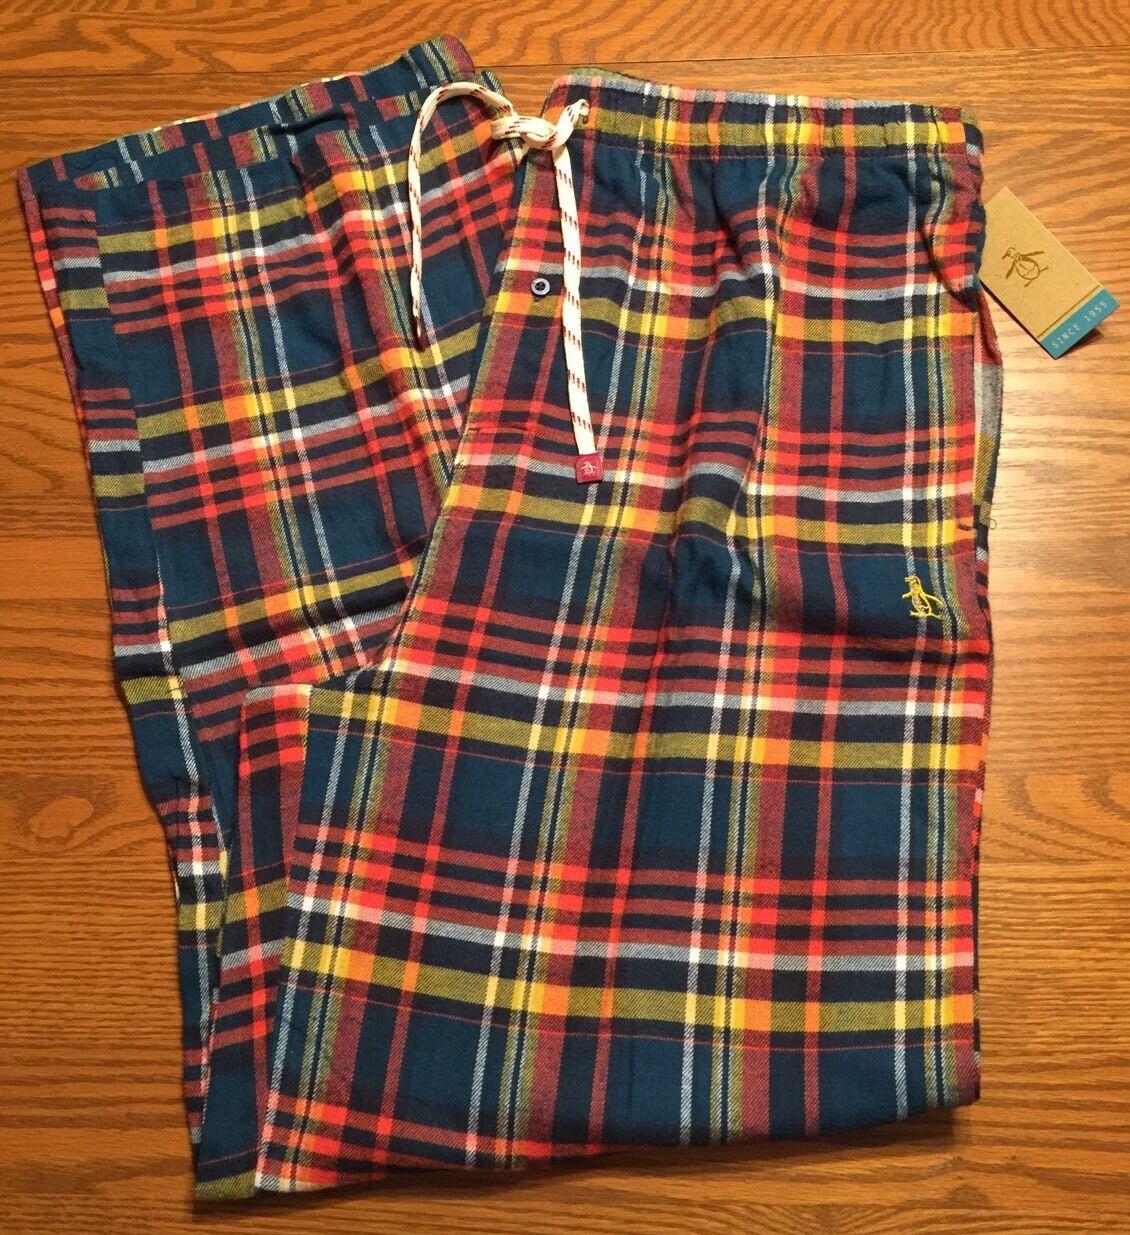 Original Penguin Mens Sleepwear Flannel Pants orange bluee Multi-color Plaid XL